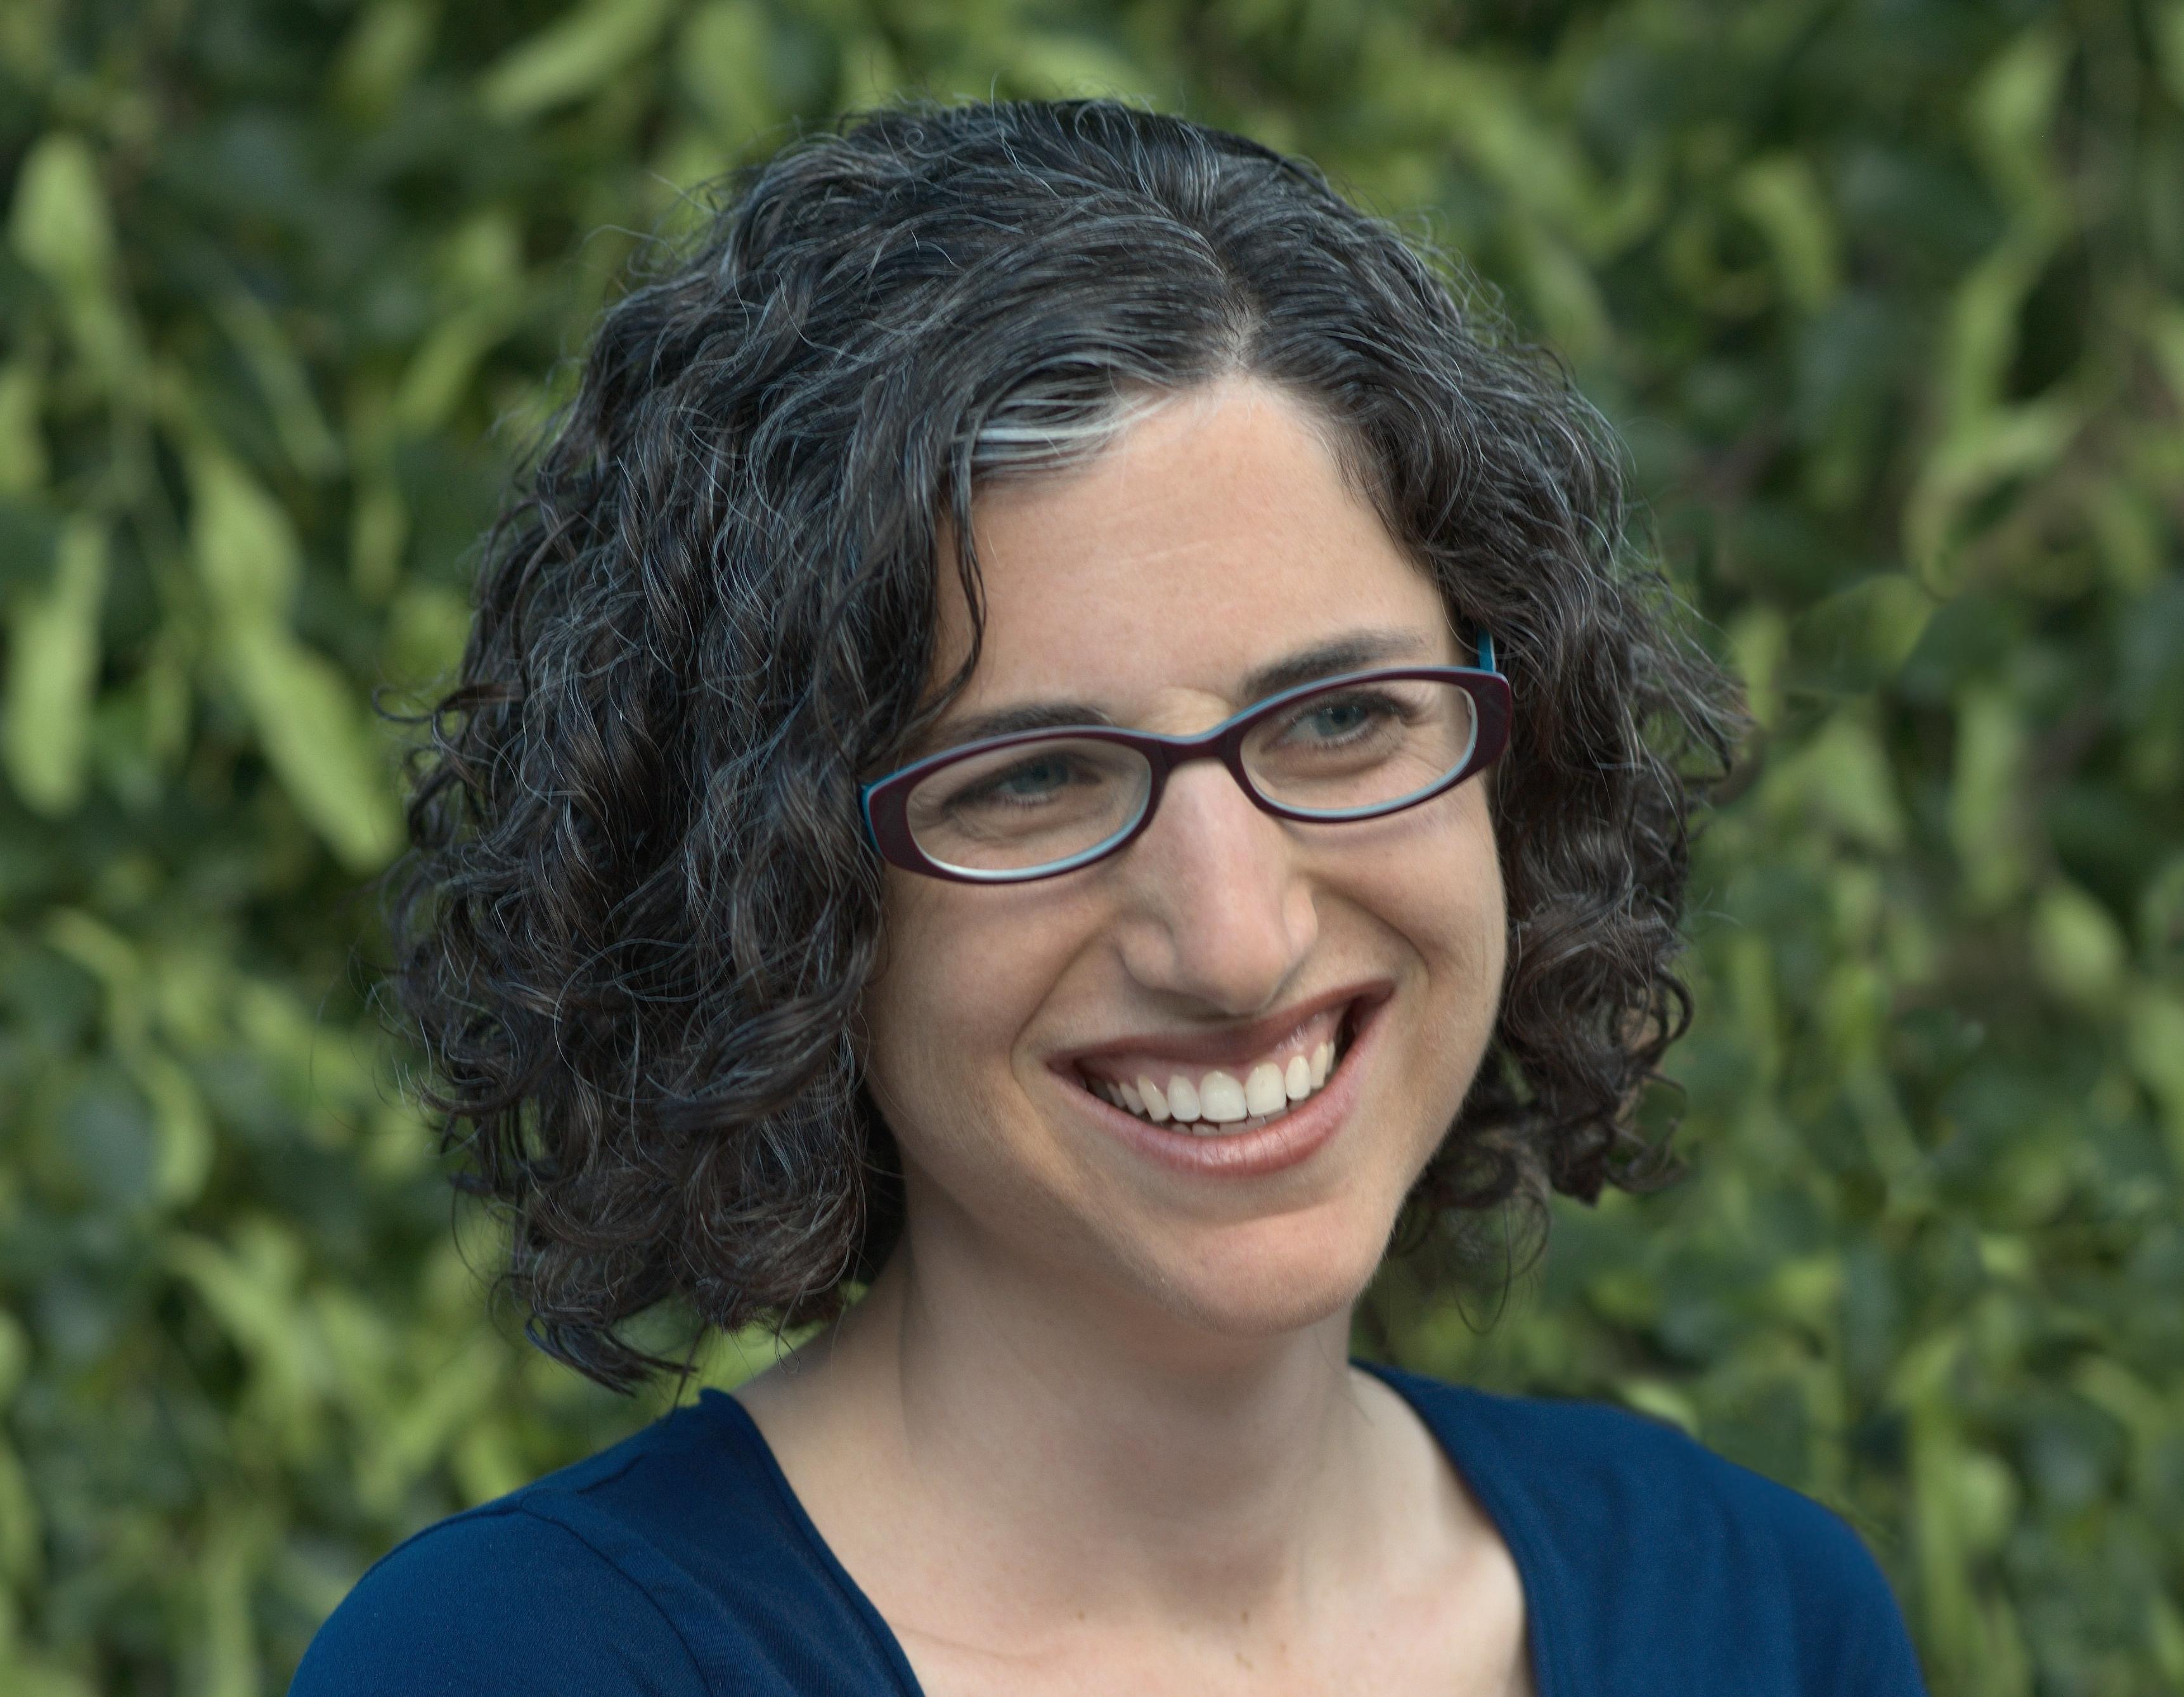 Sasha Alexander born May 17, 1973 (age 45) forecasting